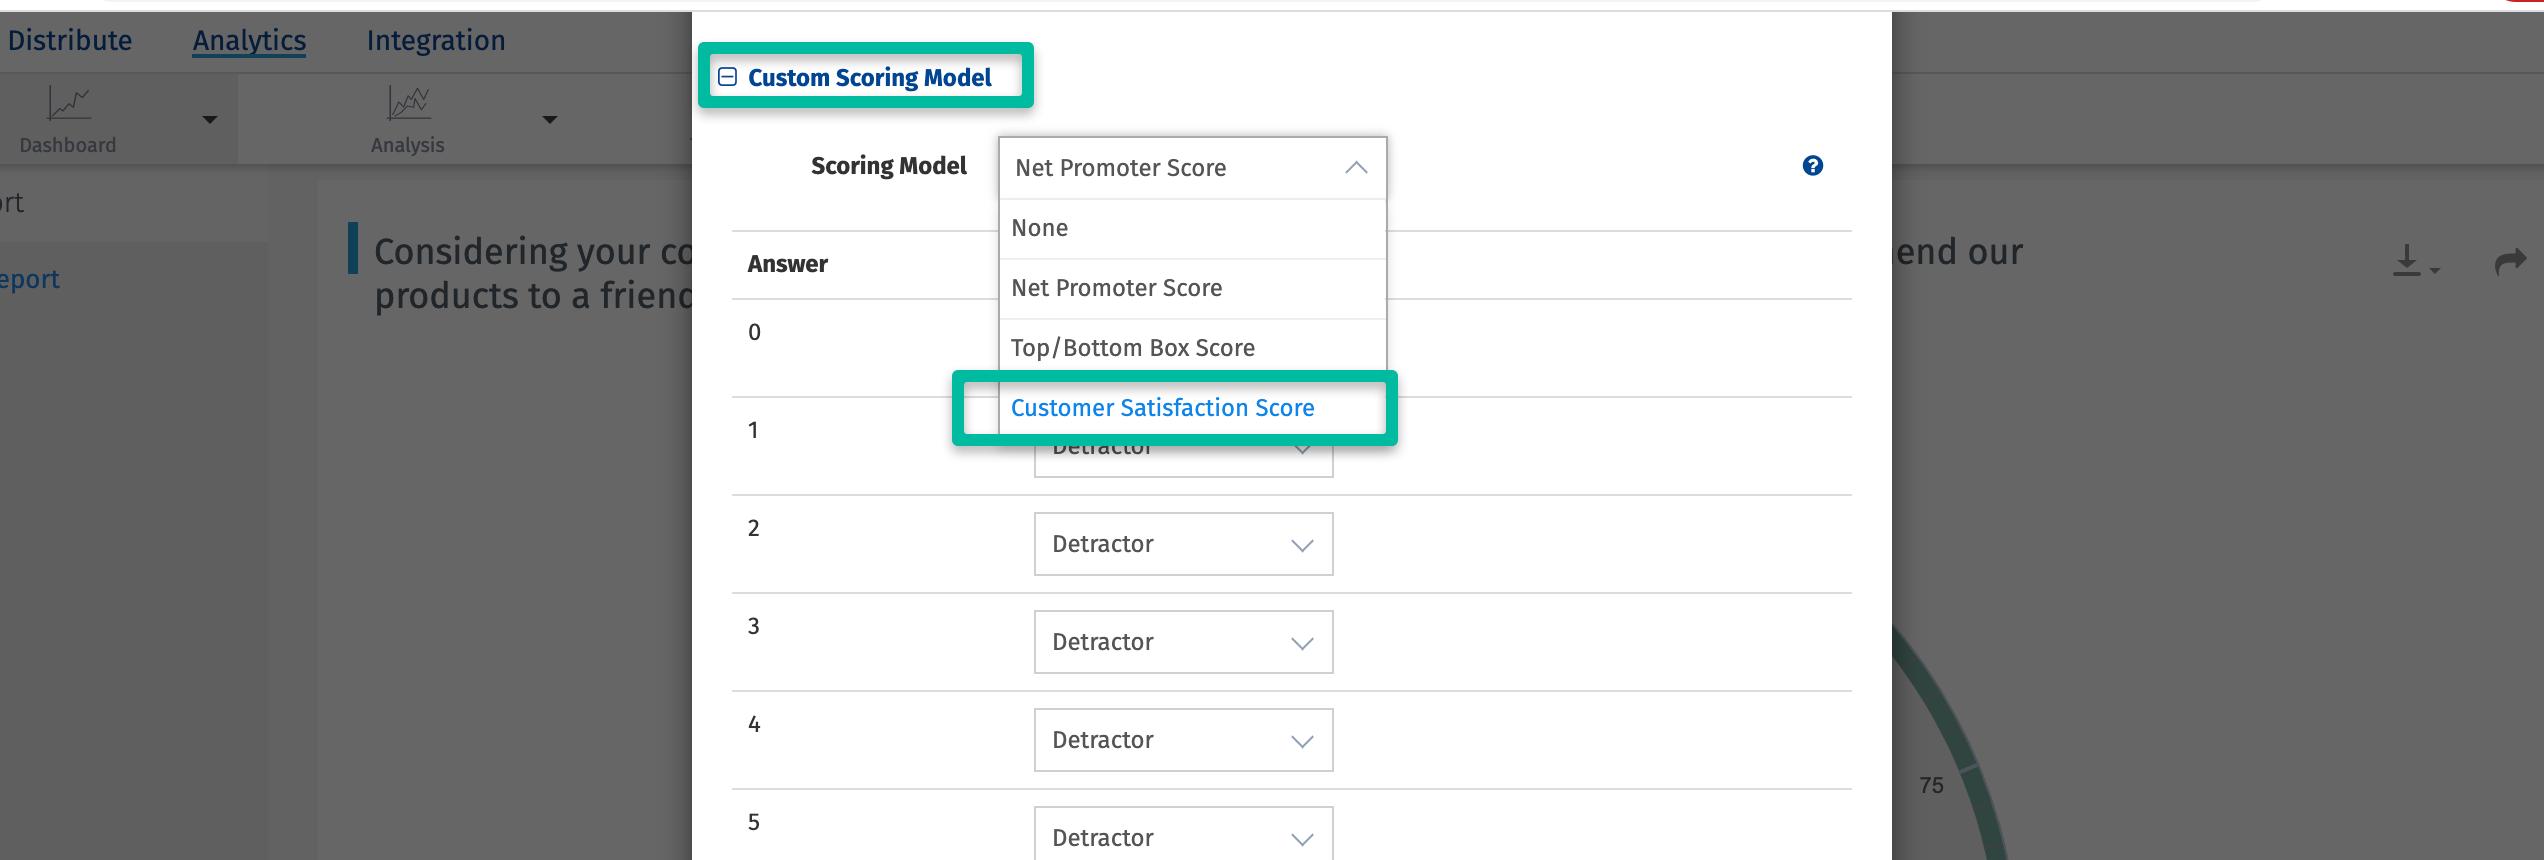 Customer Satisfaction Score Analysis and Scoring Modell